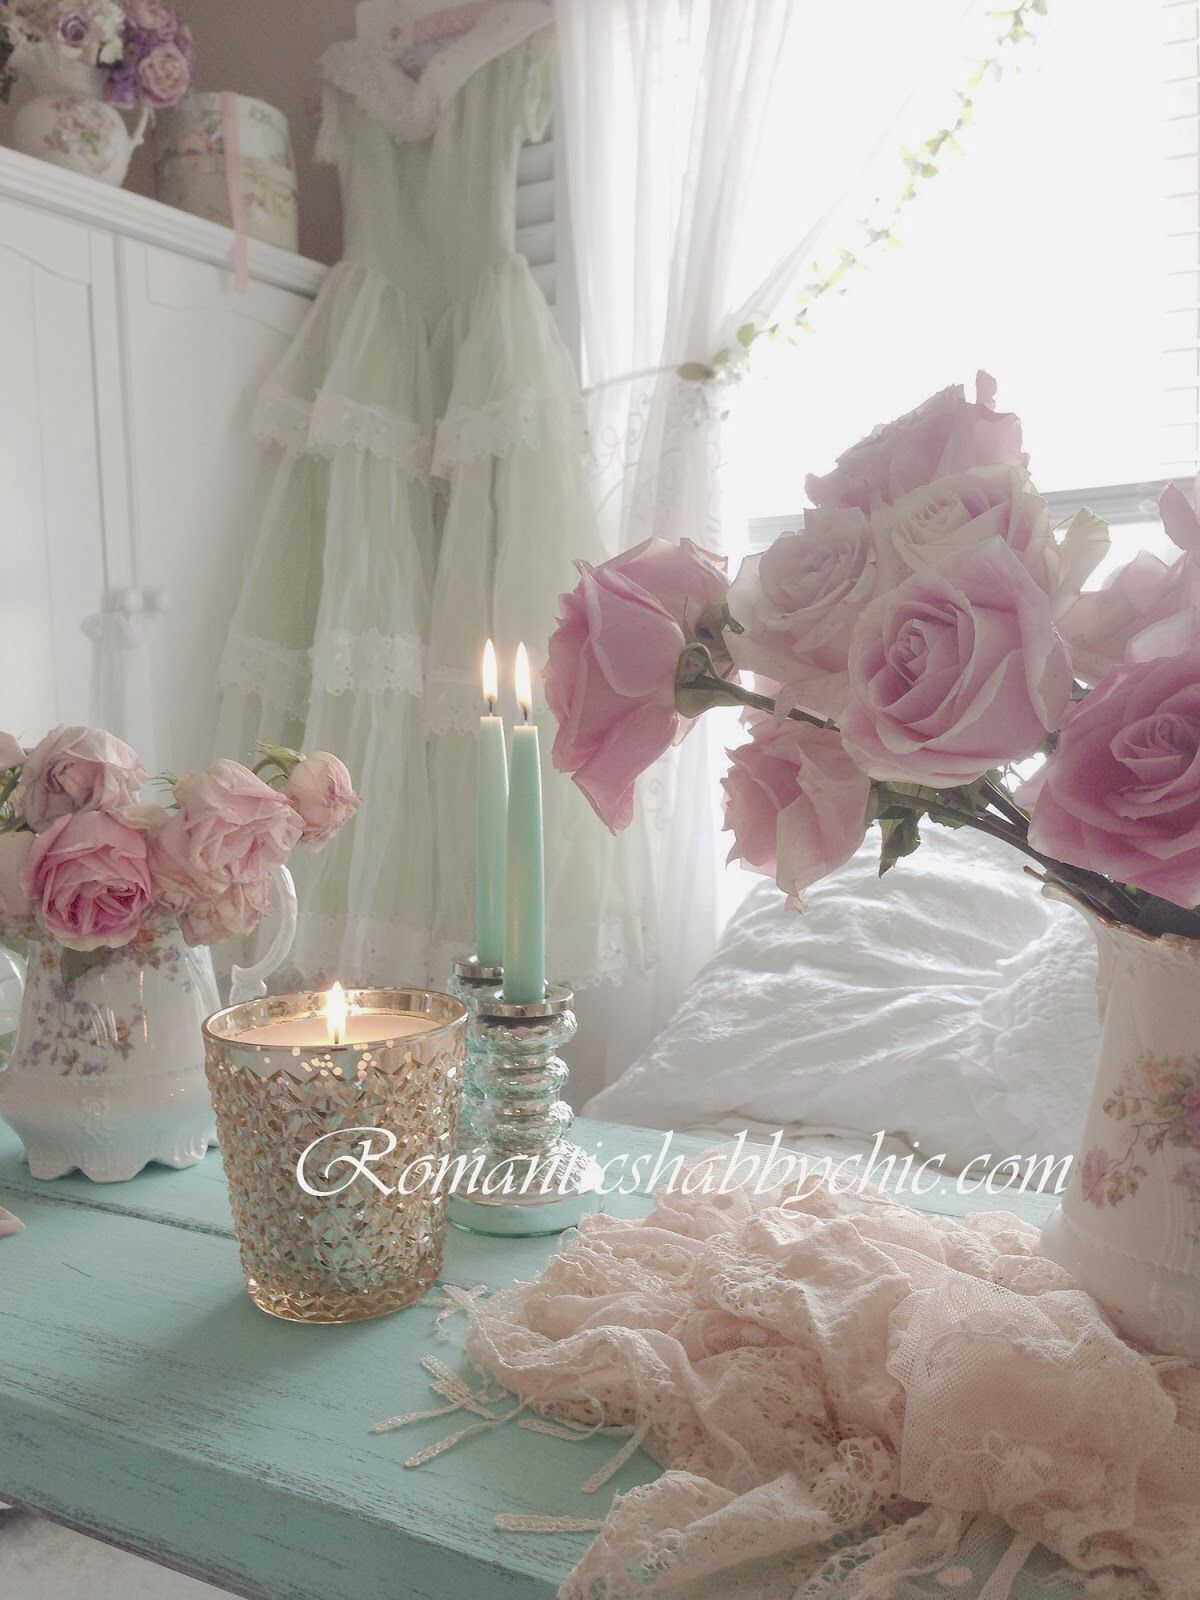 Romantic shabby chic home romantic shabby chic blog -  Romantikevim Romantik Ev Dekorasyonu Cicek Desenleri My Shabby Chic Home Bedroom Shabby Chicromantic